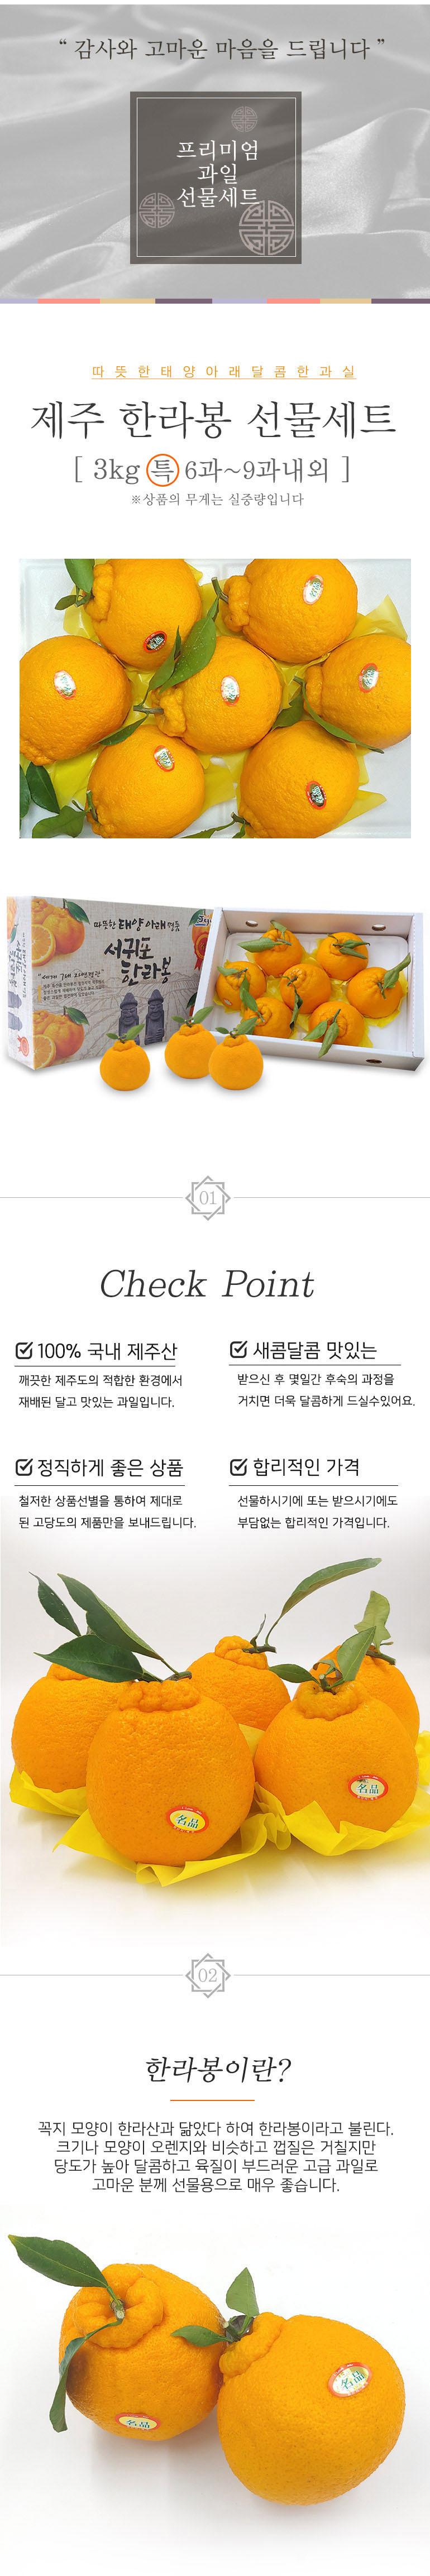 hanlabong_01_01.jpg